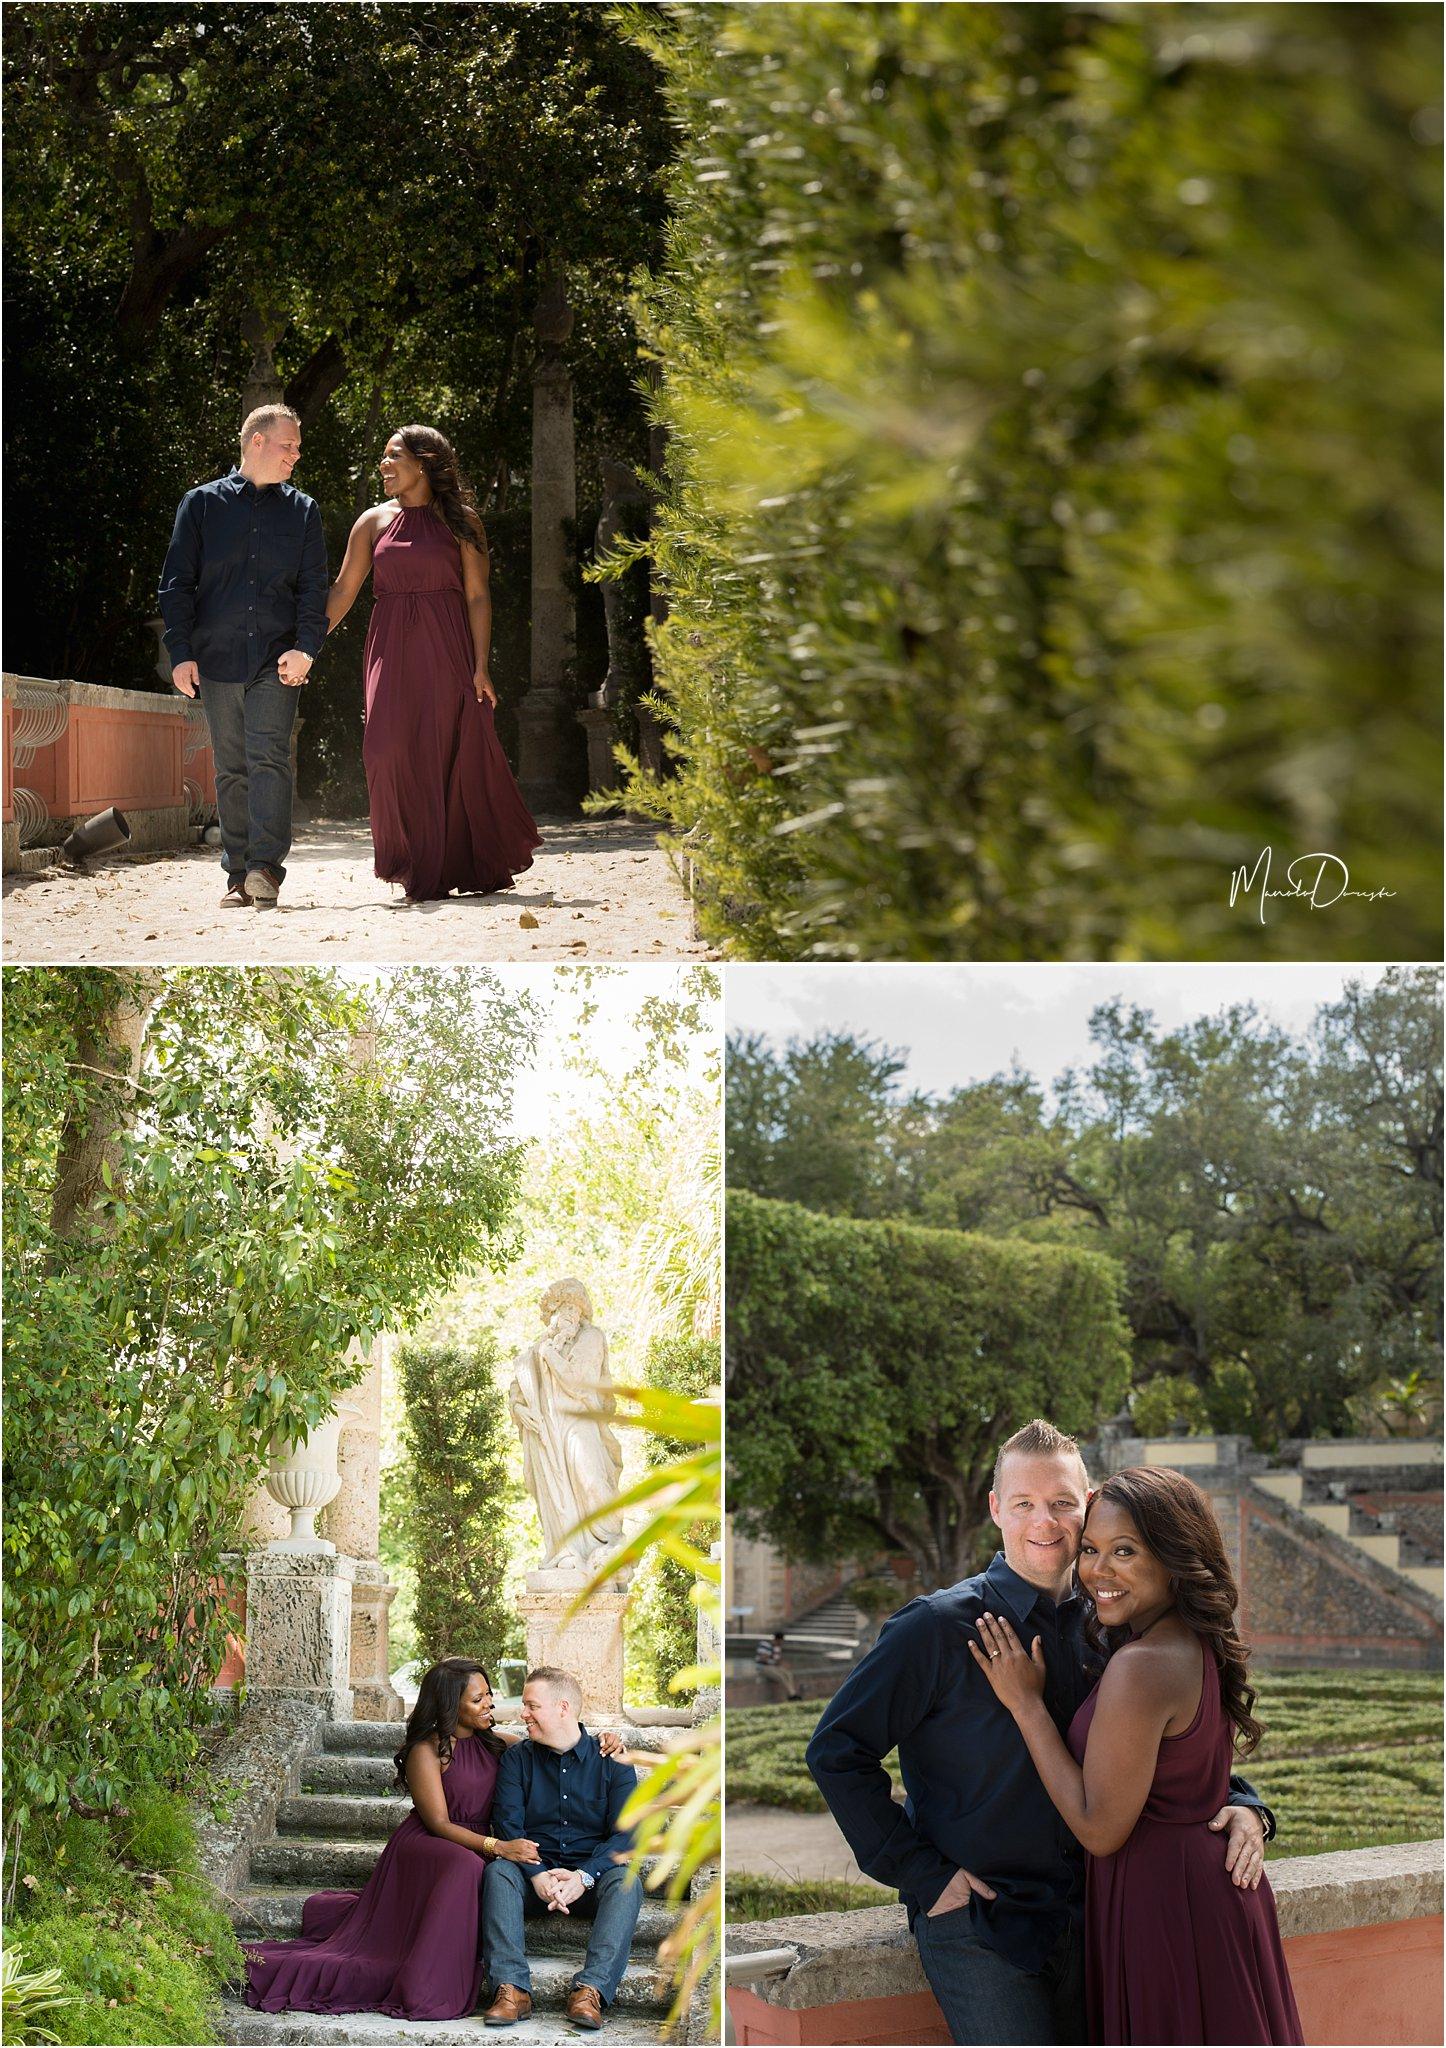 0684_ManoloDoreste_InFocusStudios_Wedding_Family_Photography_Miami_MiamiPhotographer.jpg